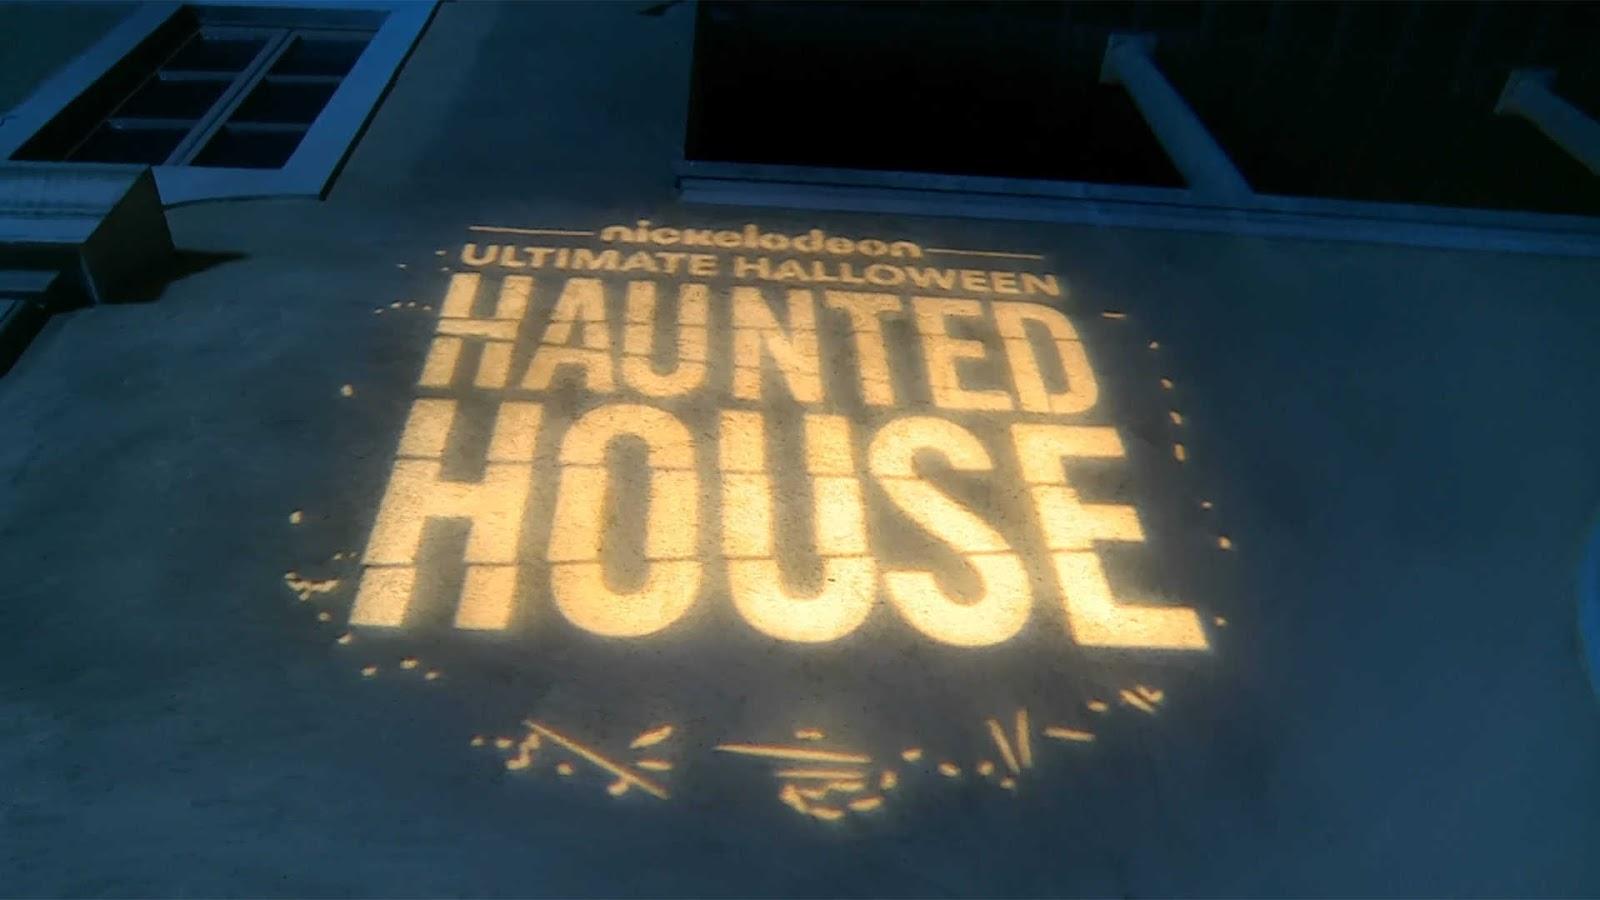 nickelodeons ultimate halloween haunted house 2018 release date